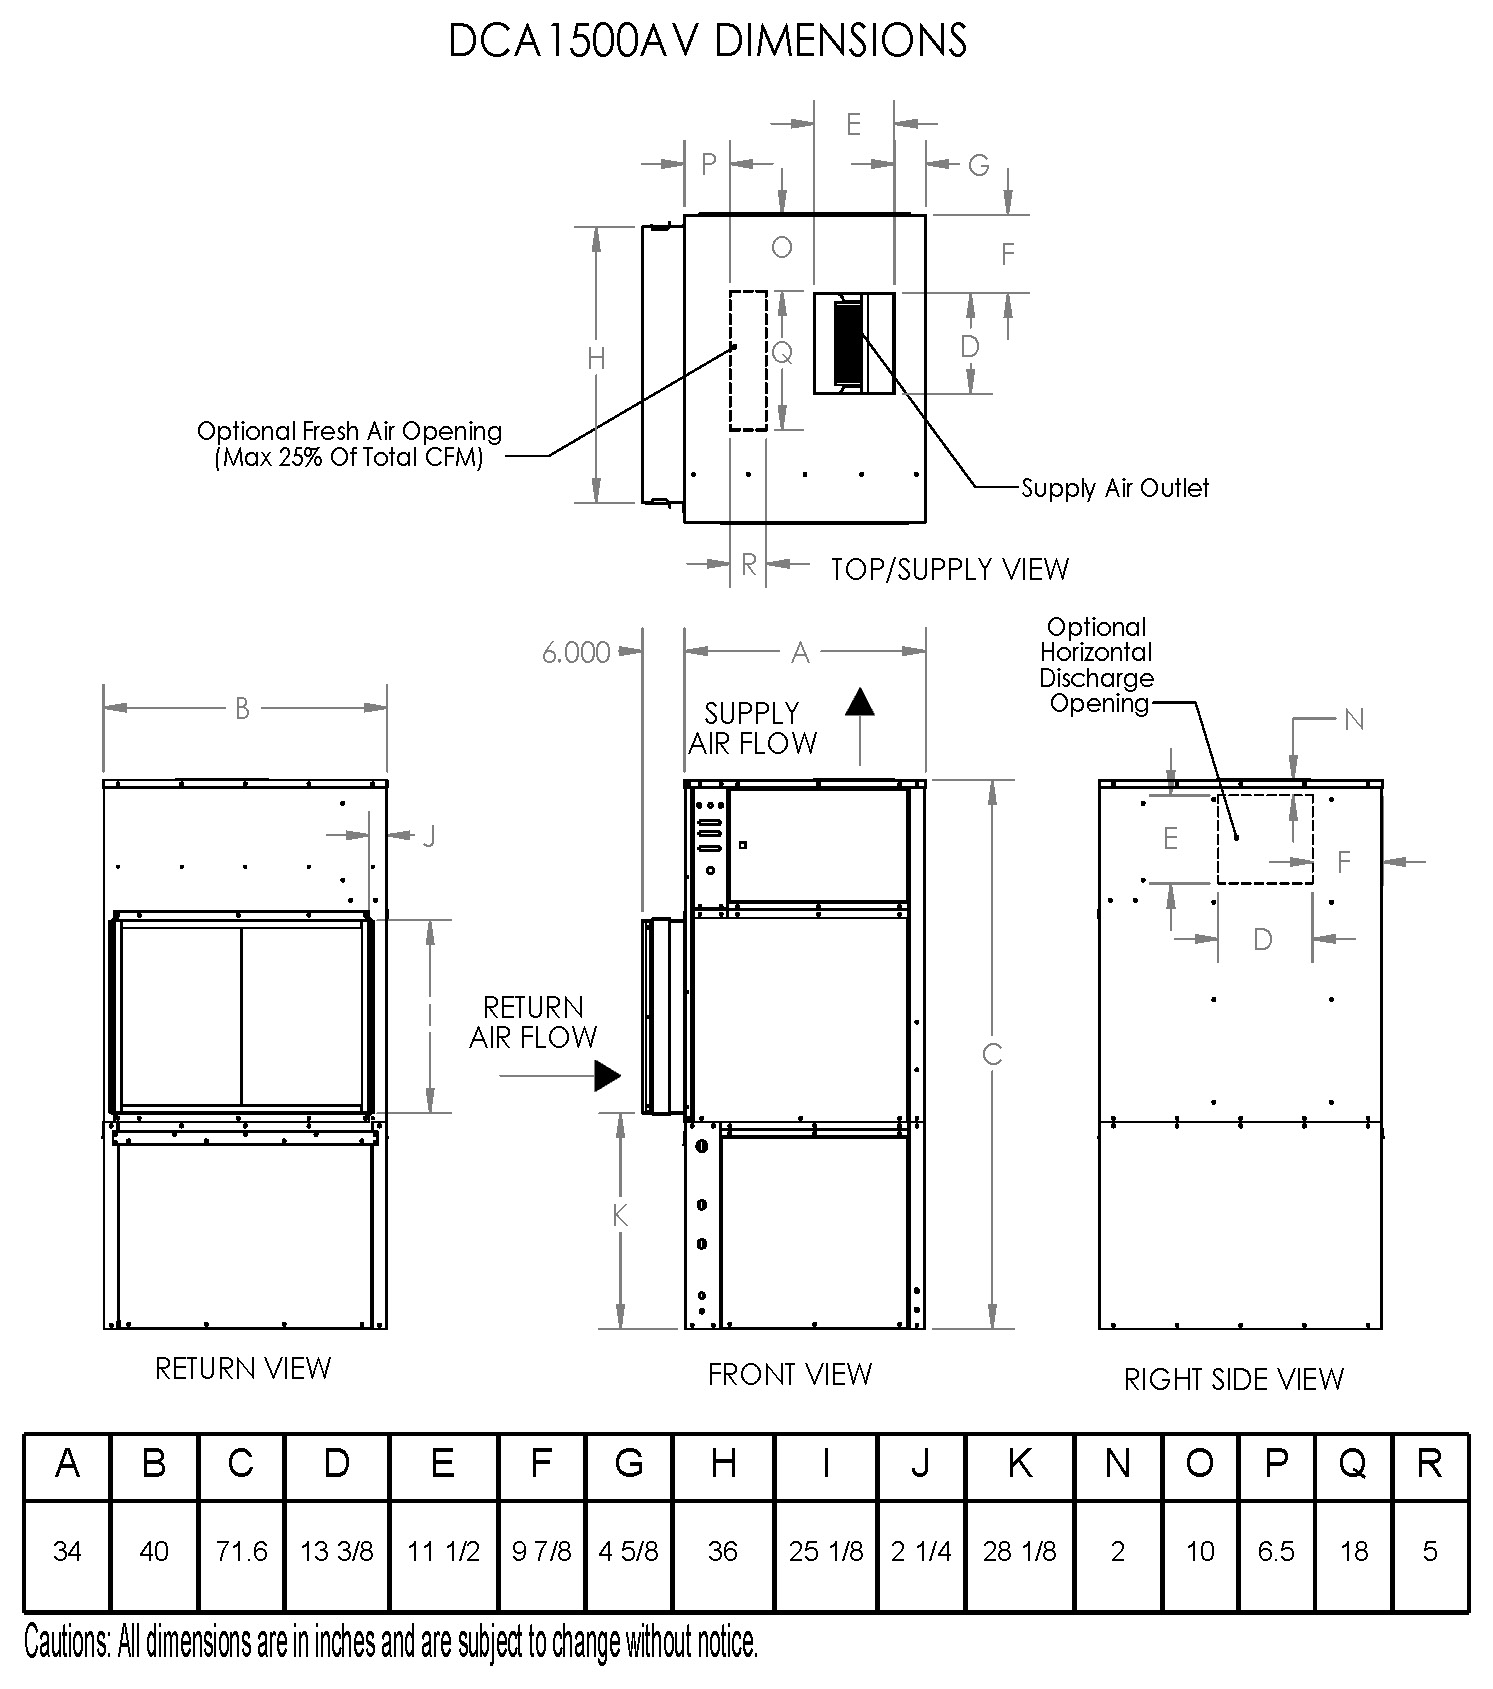 model dca1500av, air cooled non water heating dehumidifier on Timer Wiring Diagram dca 1500tv; 1500av dimensions